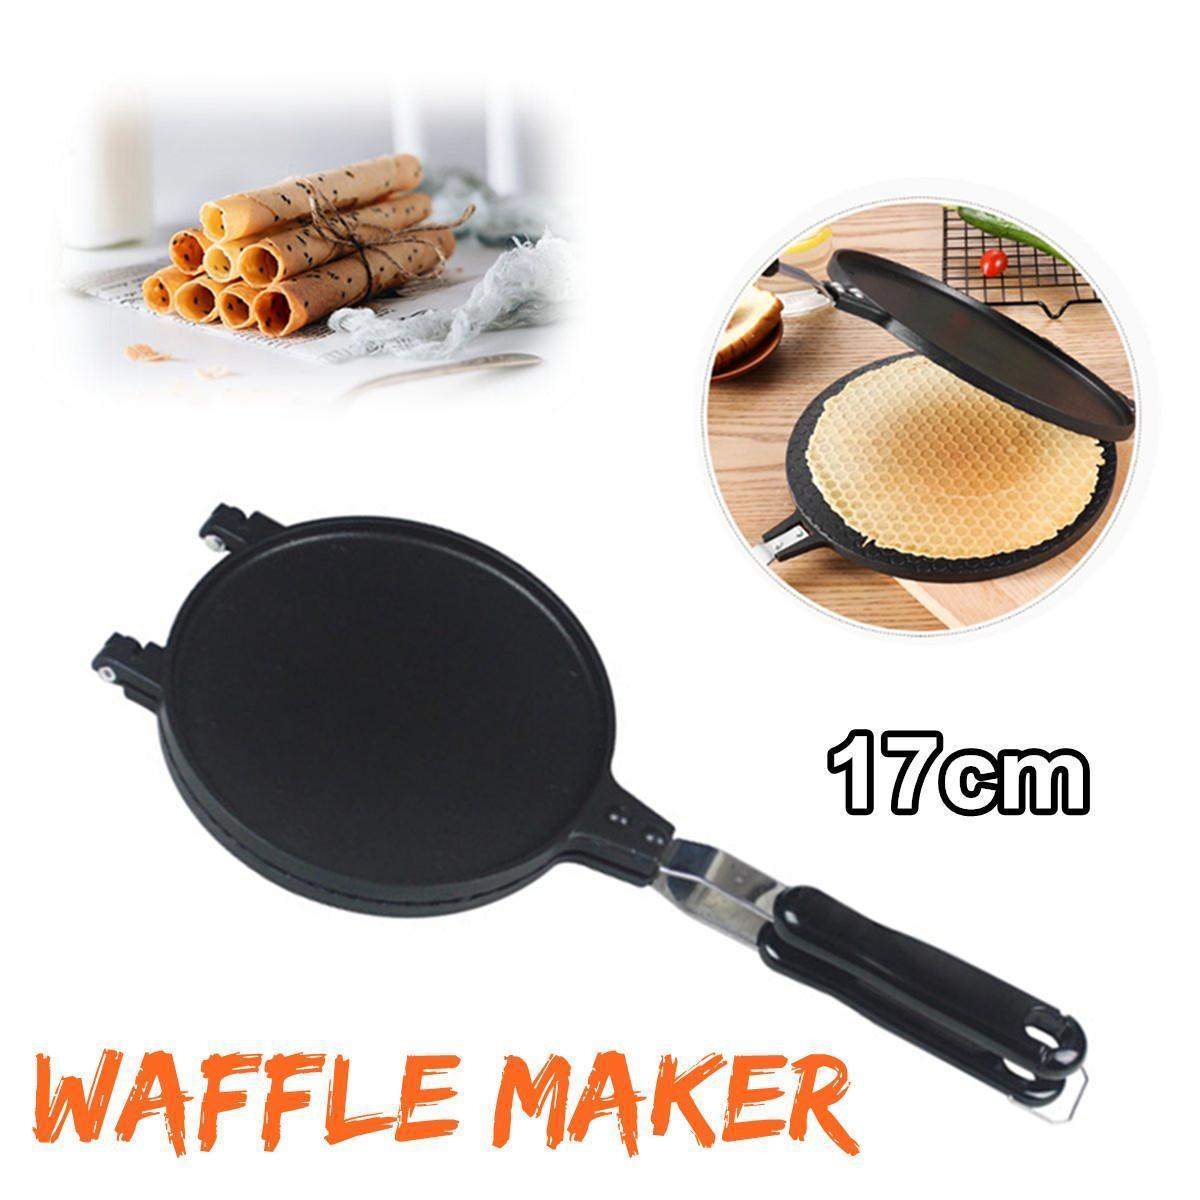 Haushalts Waffel backen Maker Küche Non-Stick Aluminiumlegierung Waffel-Hersteller Pan-Form-Form Preßplatte Waffeleisen Backen-Werkzeuge